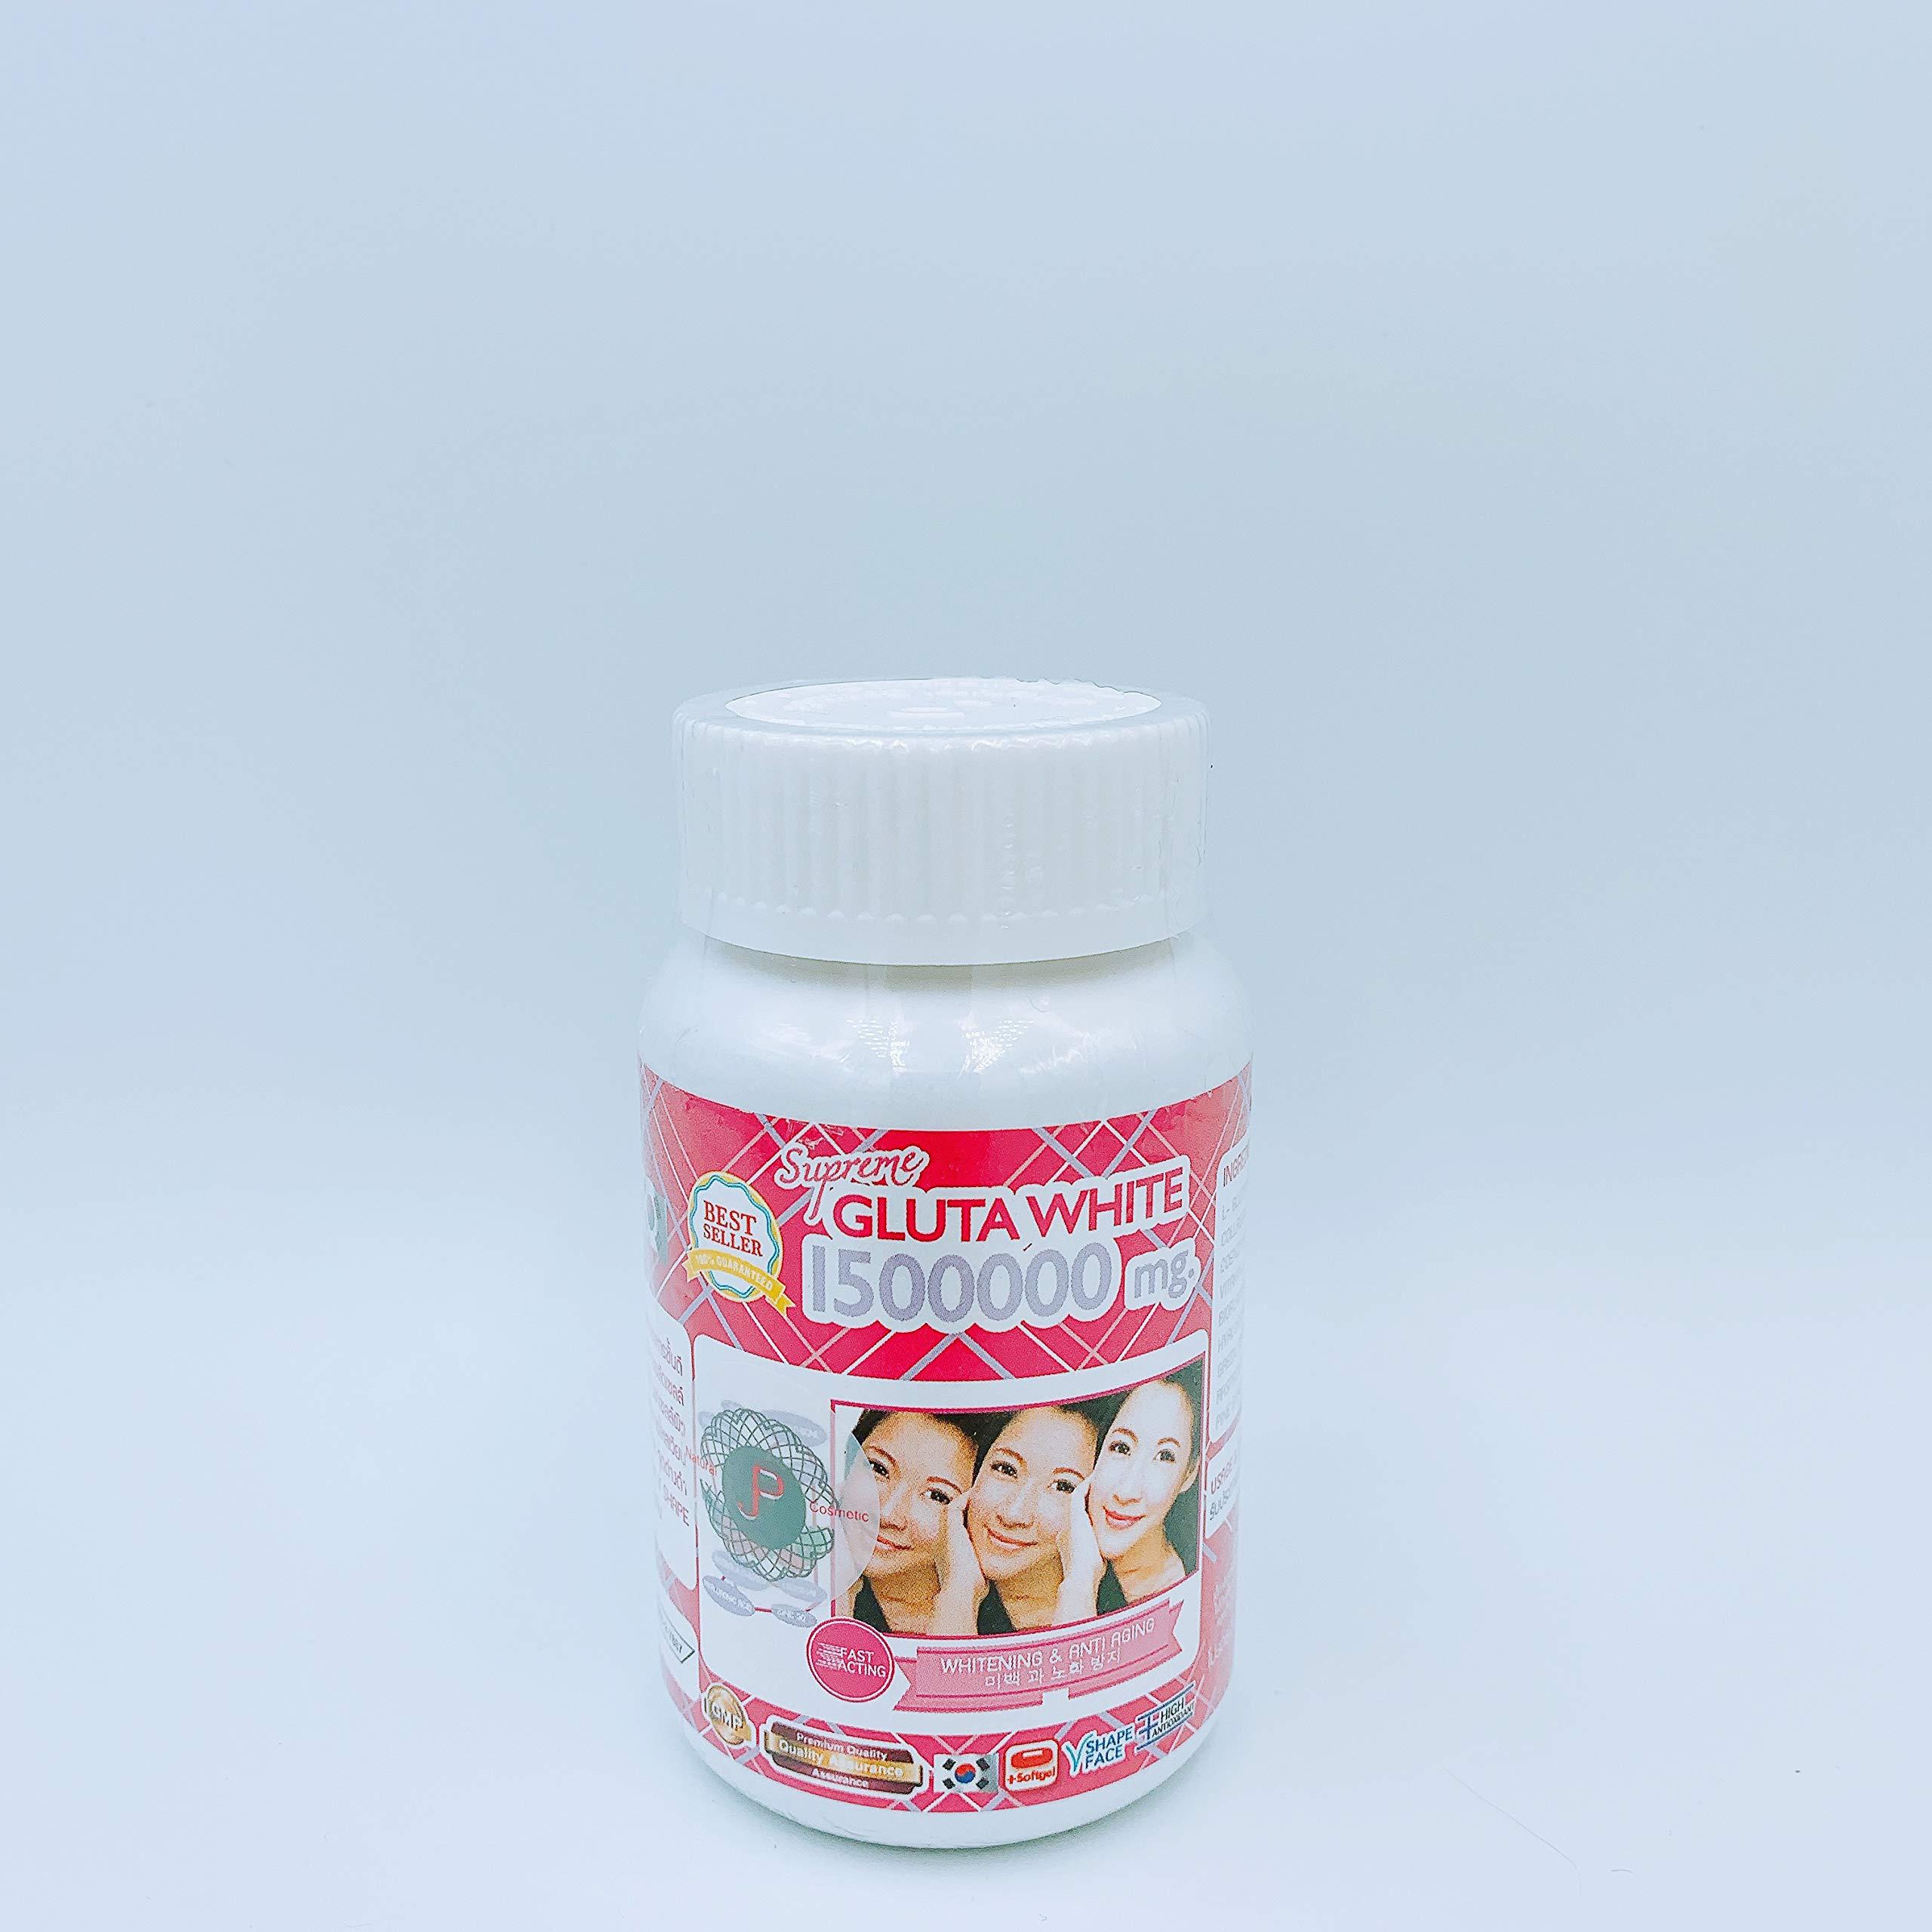 1 Bottle X 30 Softgels Supreme Gluta White 1500000mg. Super Whitening Glutathione Anti - Aging. (Supreme Whitening Skin Boost up Collagen Remove Dark Spot and Scar Tighten Pore Healthy Skin and Hair)